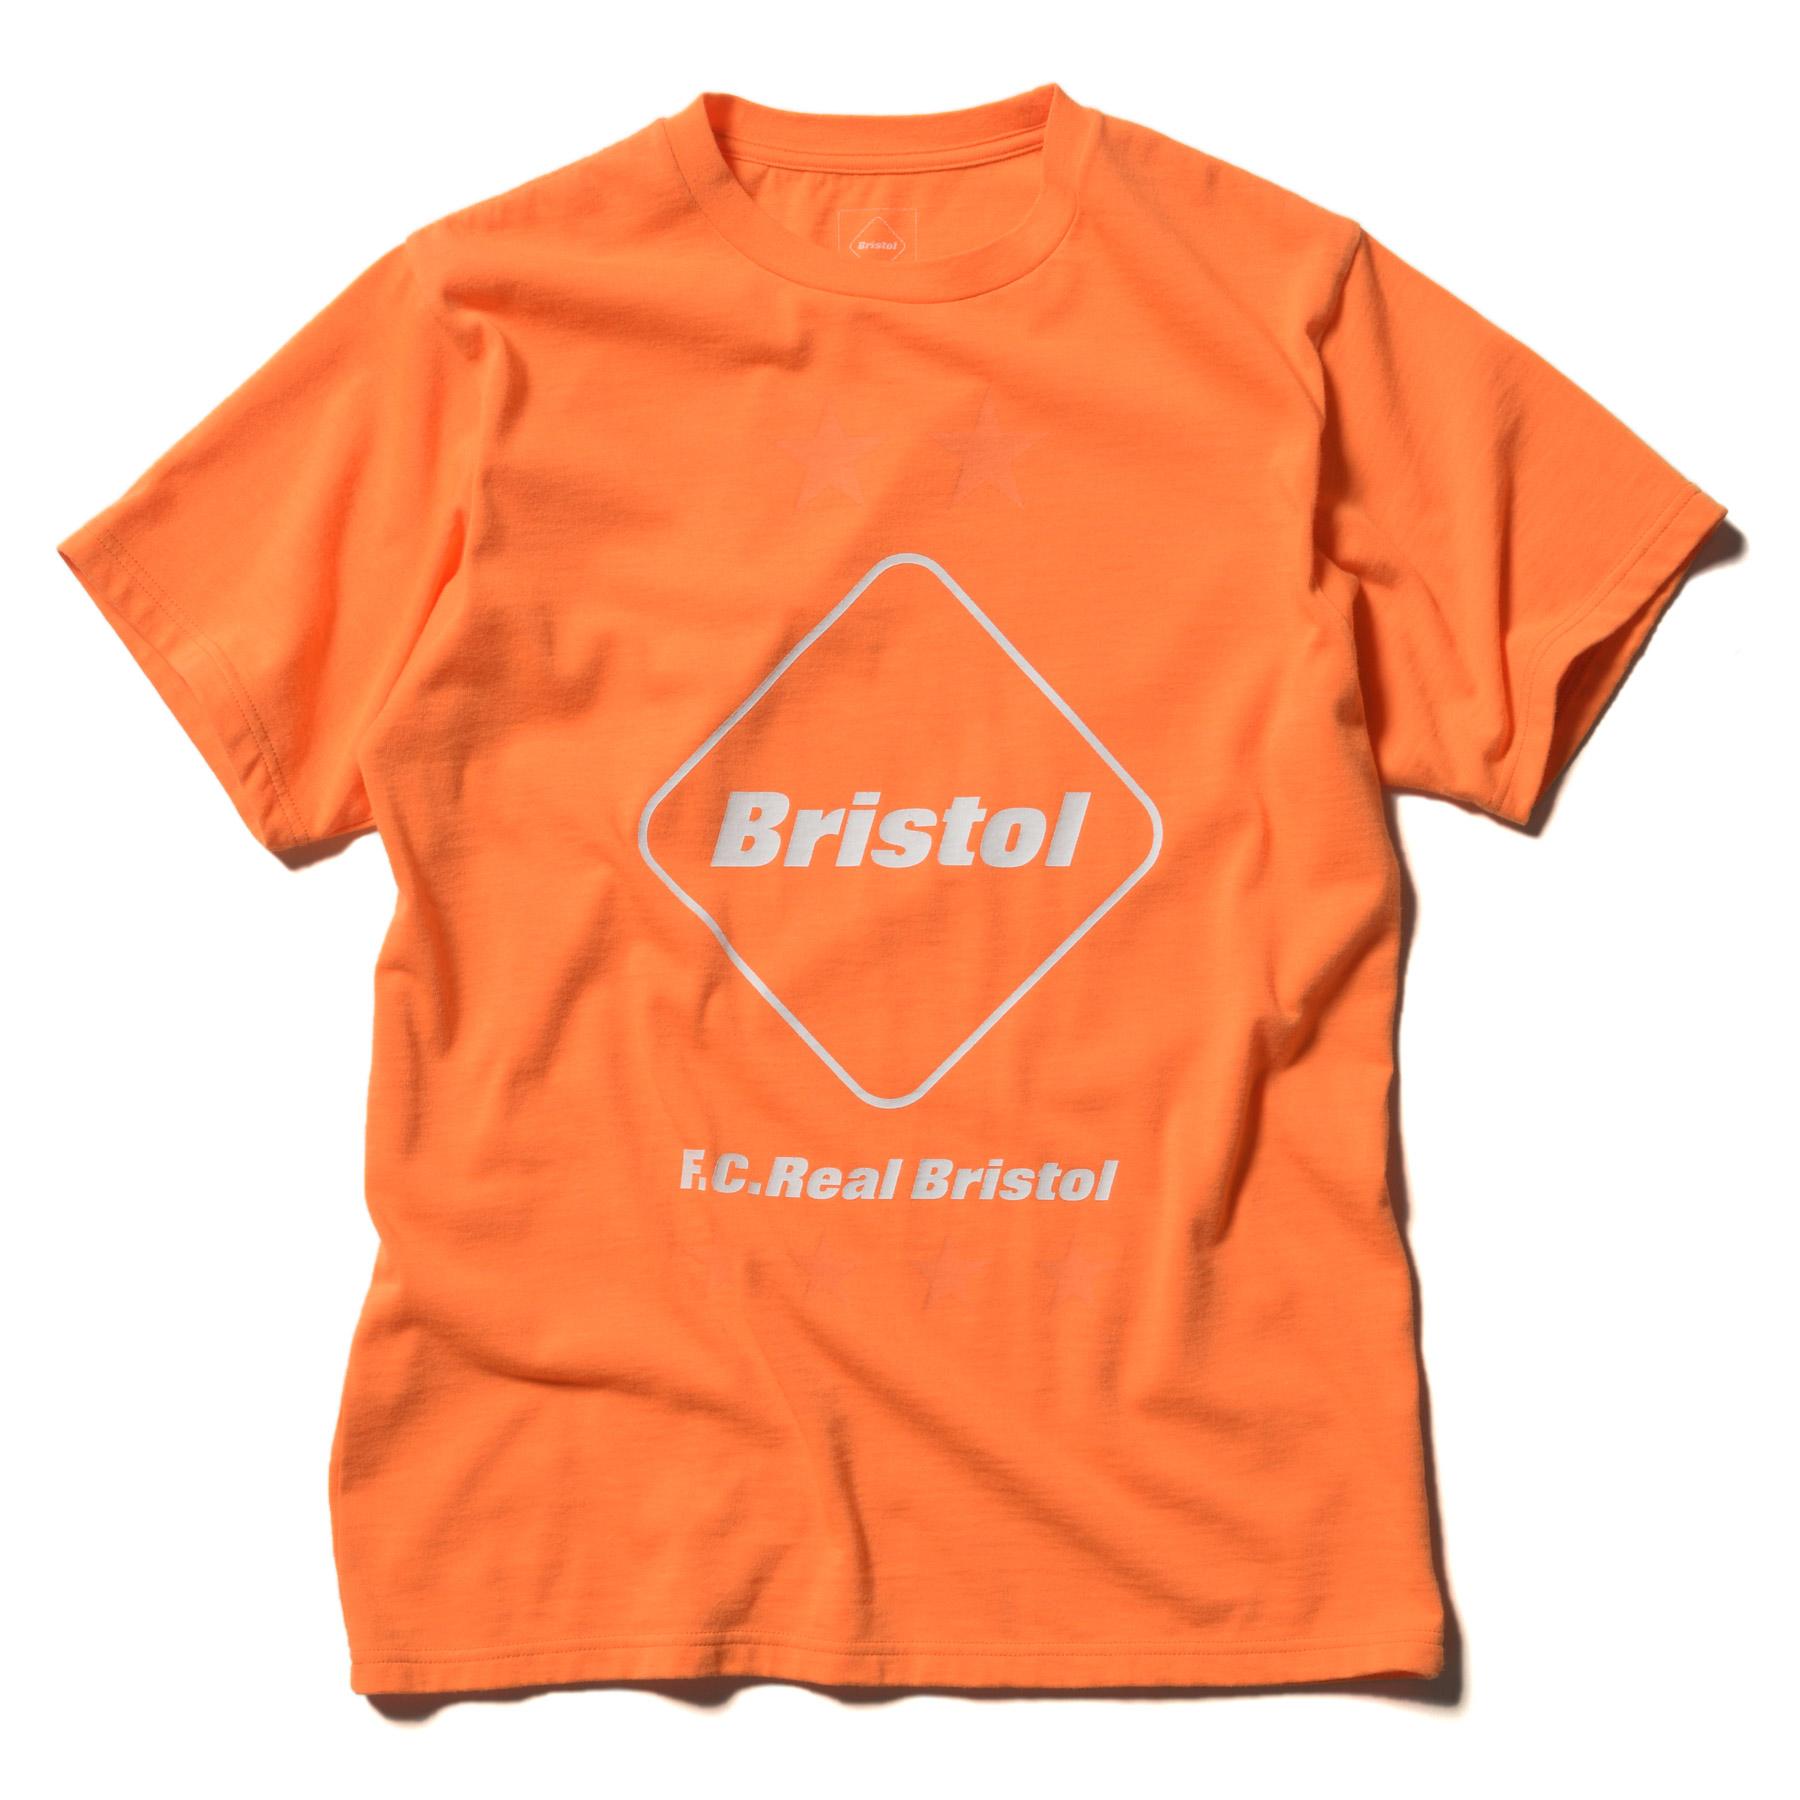 F.C.Real Bristol / EMBLEM TEE (Orange)